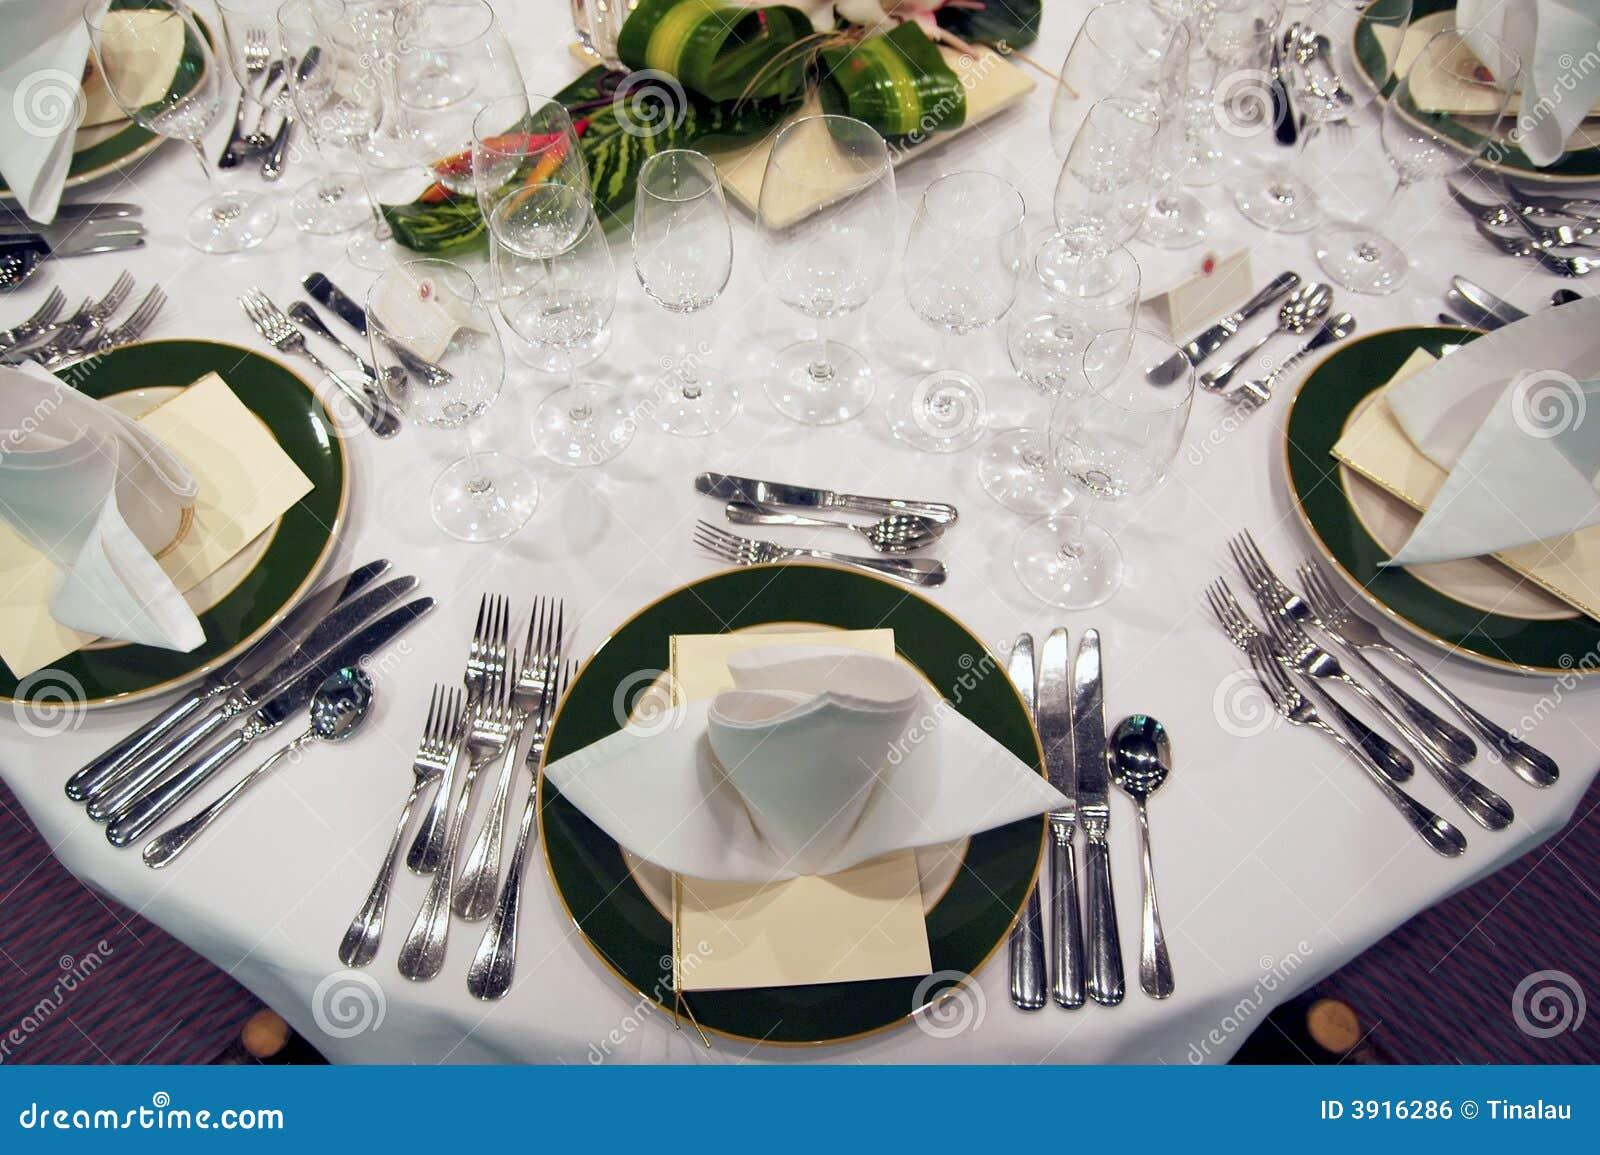 Formal Dinner Setting Royalty Free Stock Image Image  : formal dinner setting 3916286 from www.dreamstime.com size 1300 x 955 jpeg 149kB